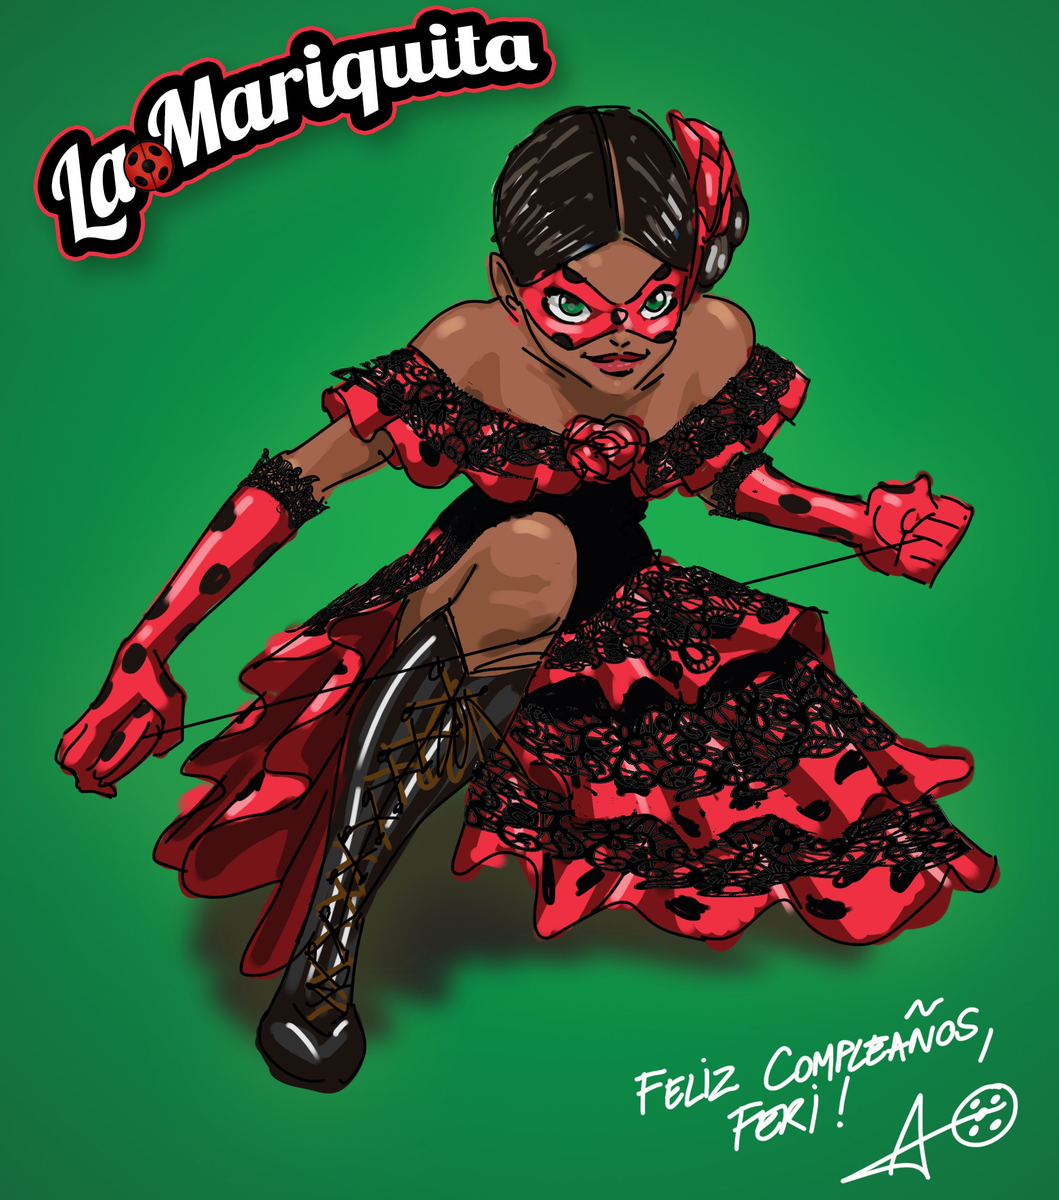 La Mariquita